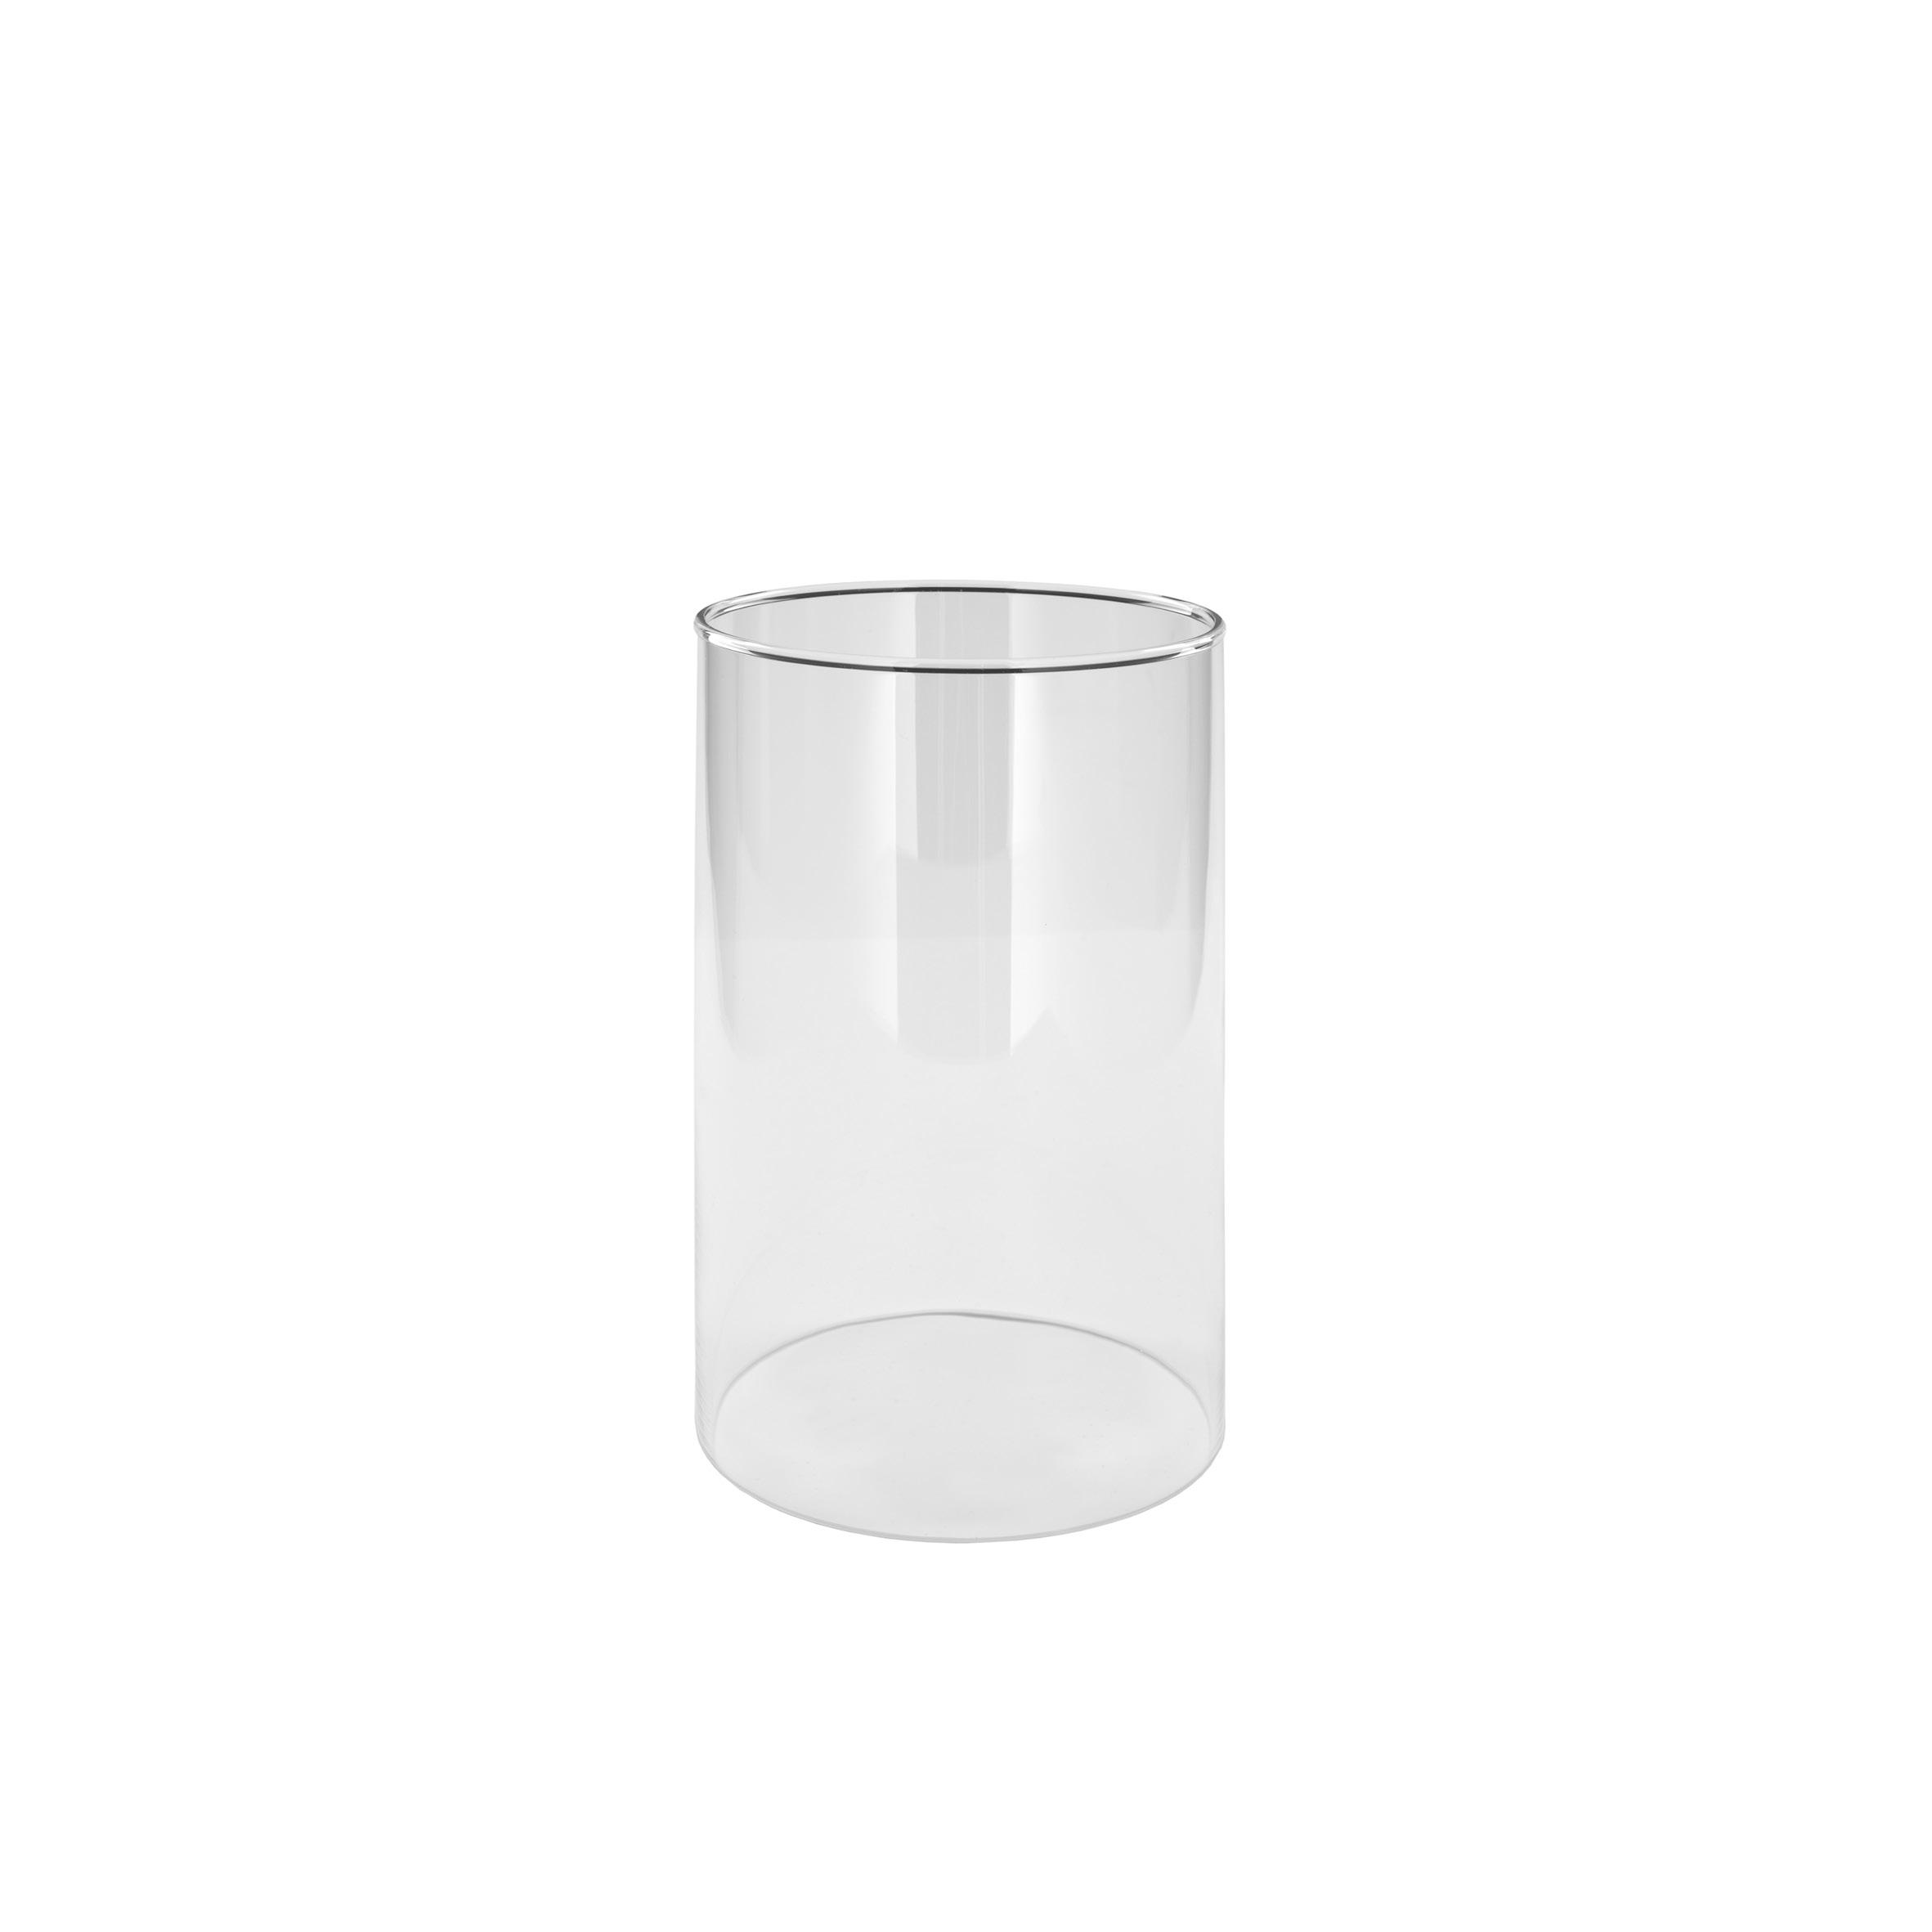 Berühmt Bilderrahmen Ersatzglas Zeitgenössisch - Rahmen Ideen ...